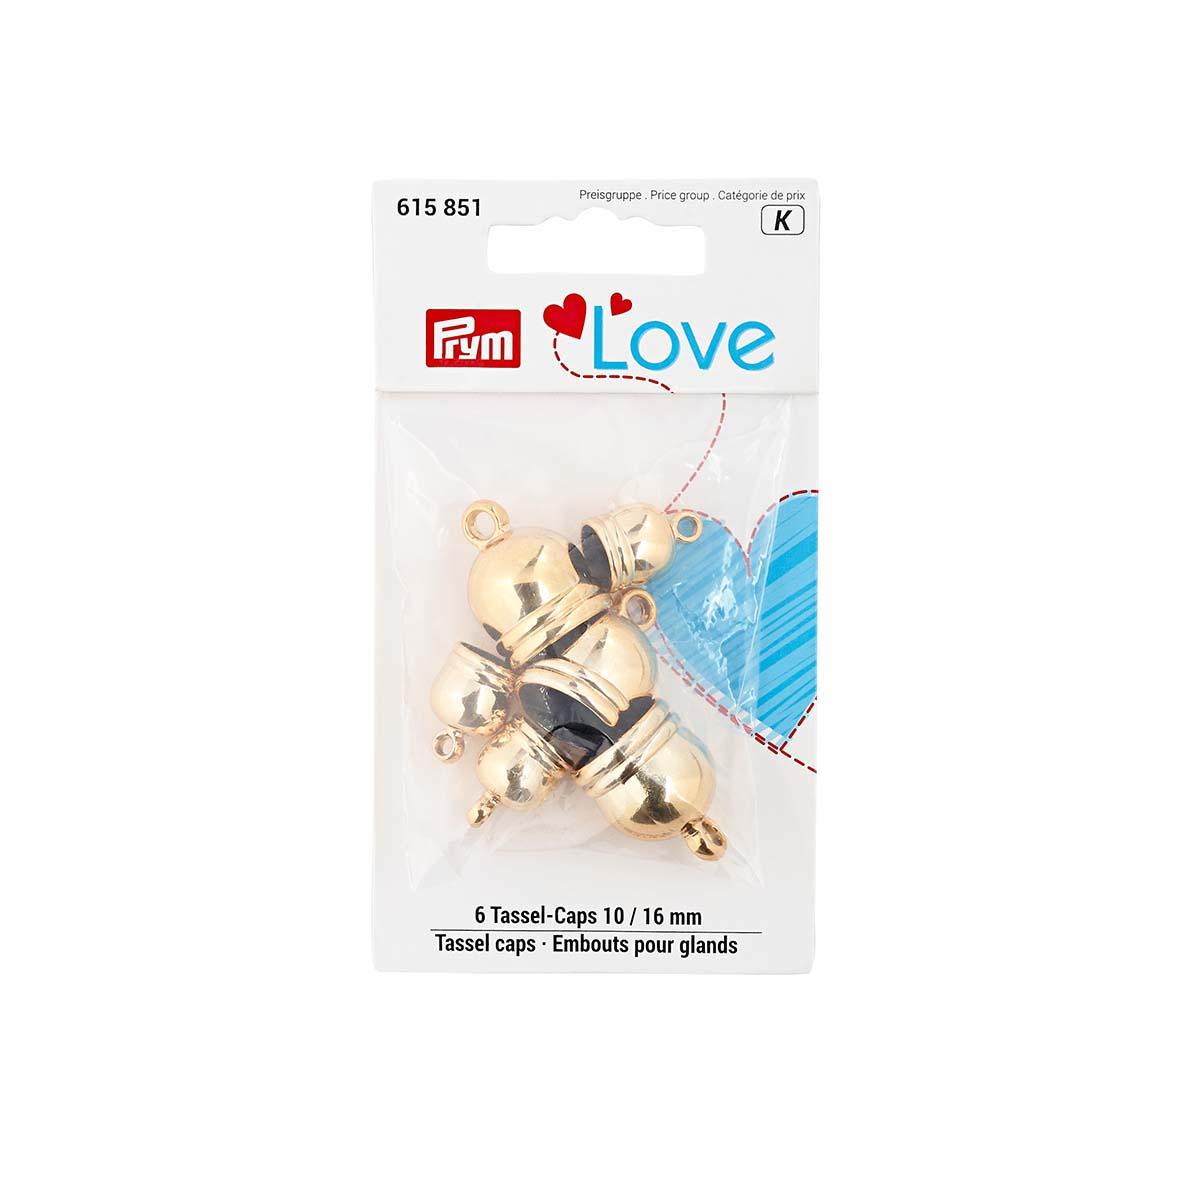 615851 Набор концевиков для кистей Prym Love, пластик, золотой цв. 10мм и 16мм 6шт Prym